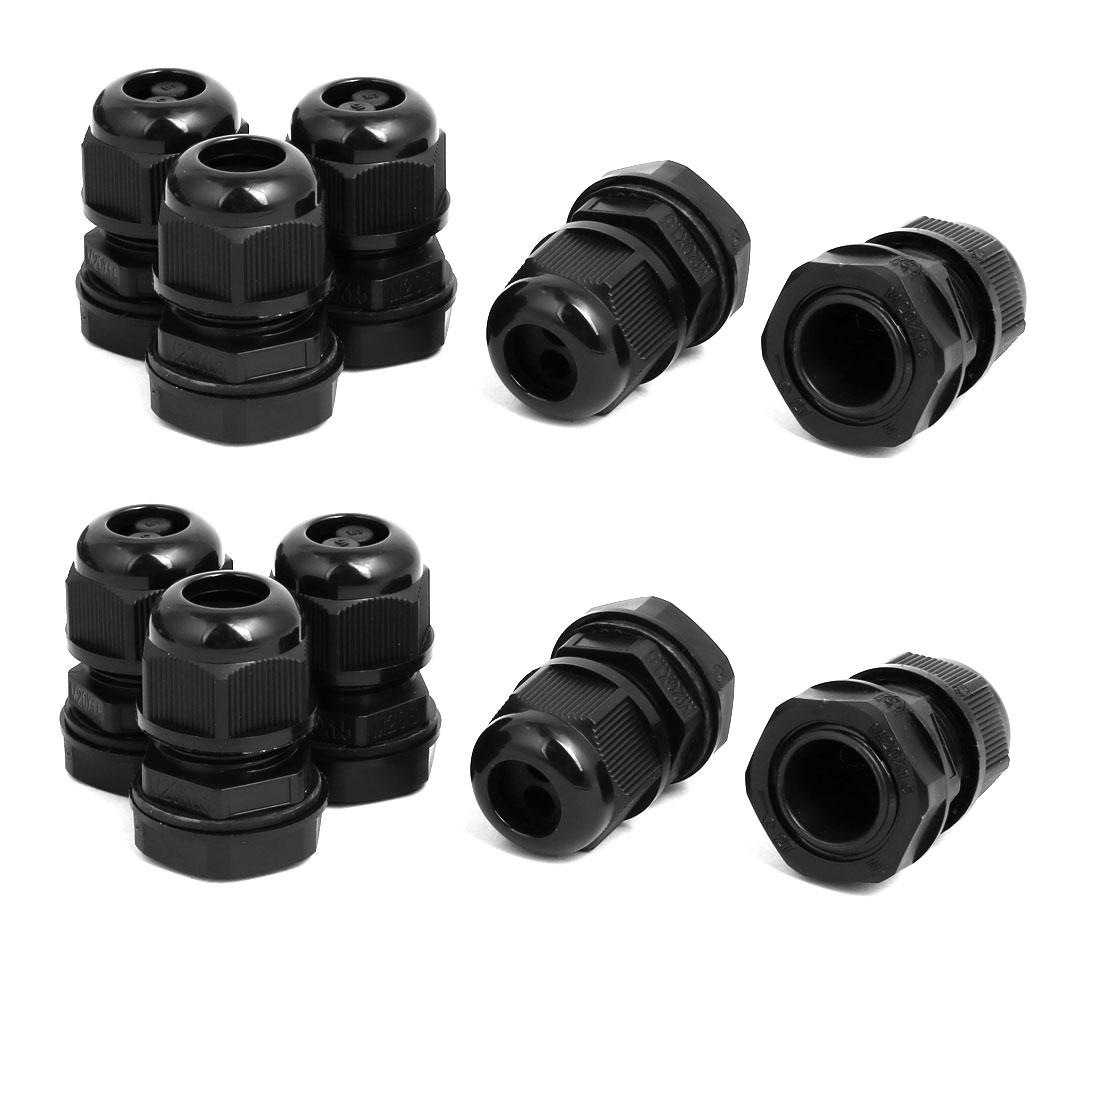 M20 x1.5mm 1.6mm-2.5mm 2 Holes Adjustable Cables Gland Black 10pcs